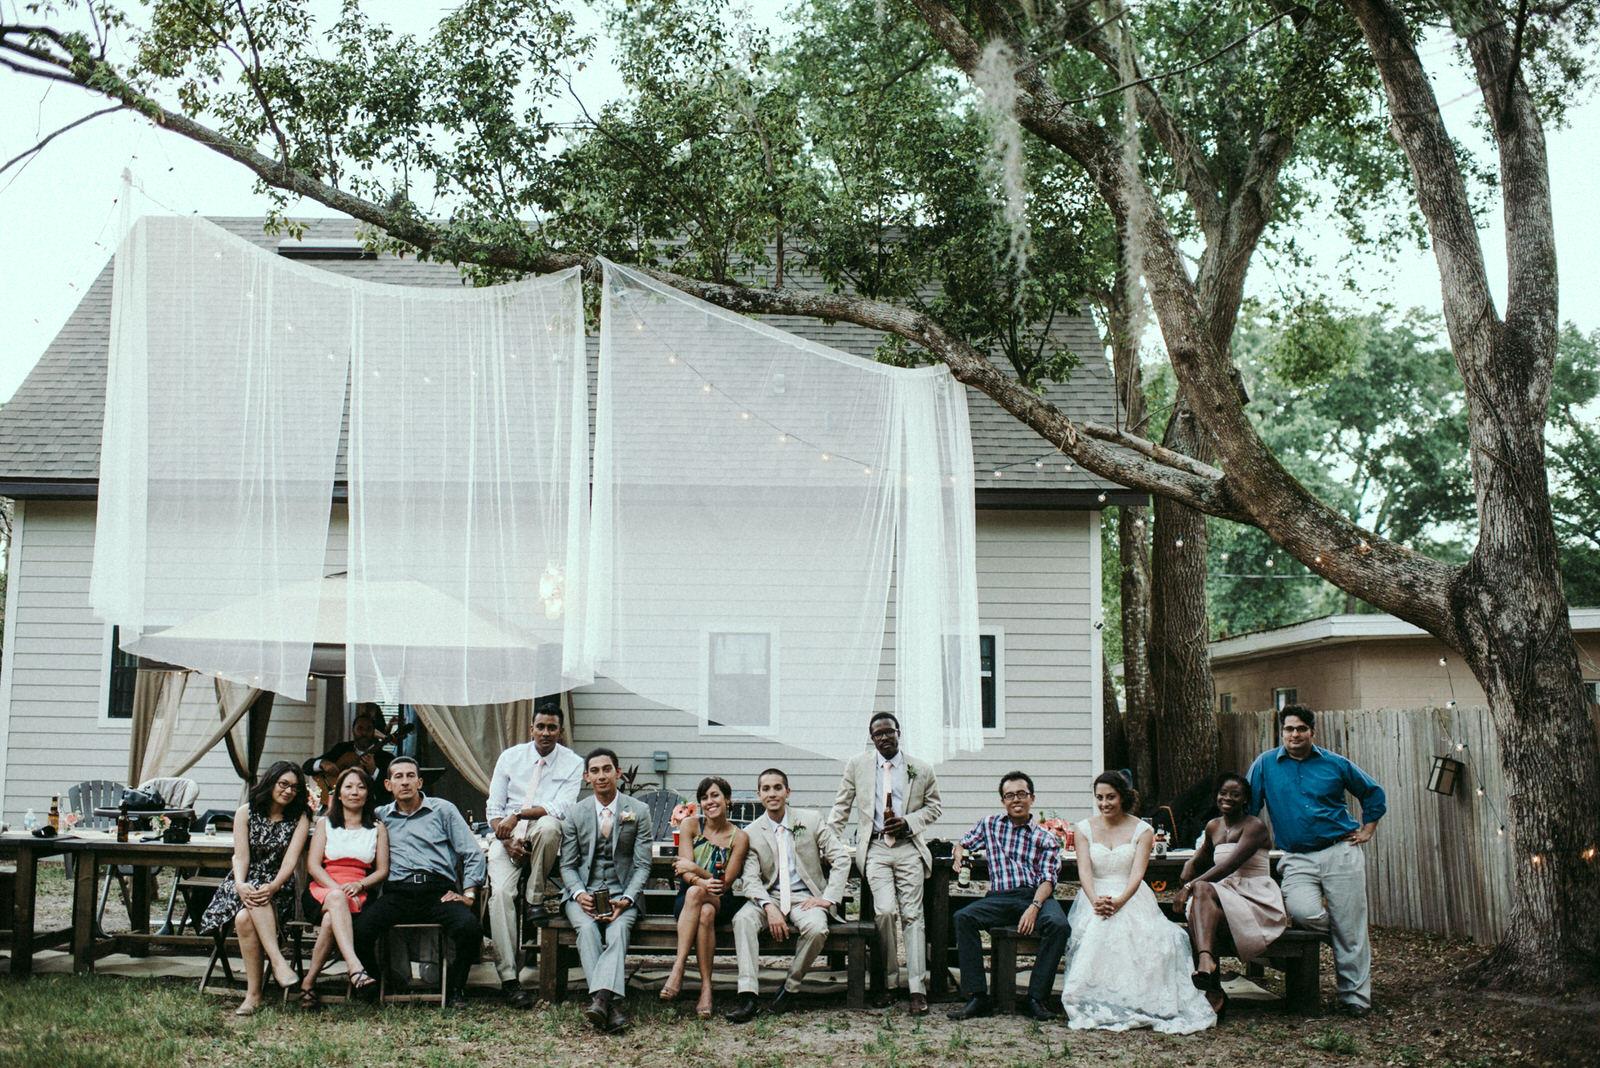 30 rising stars in weding photography-21.jpg